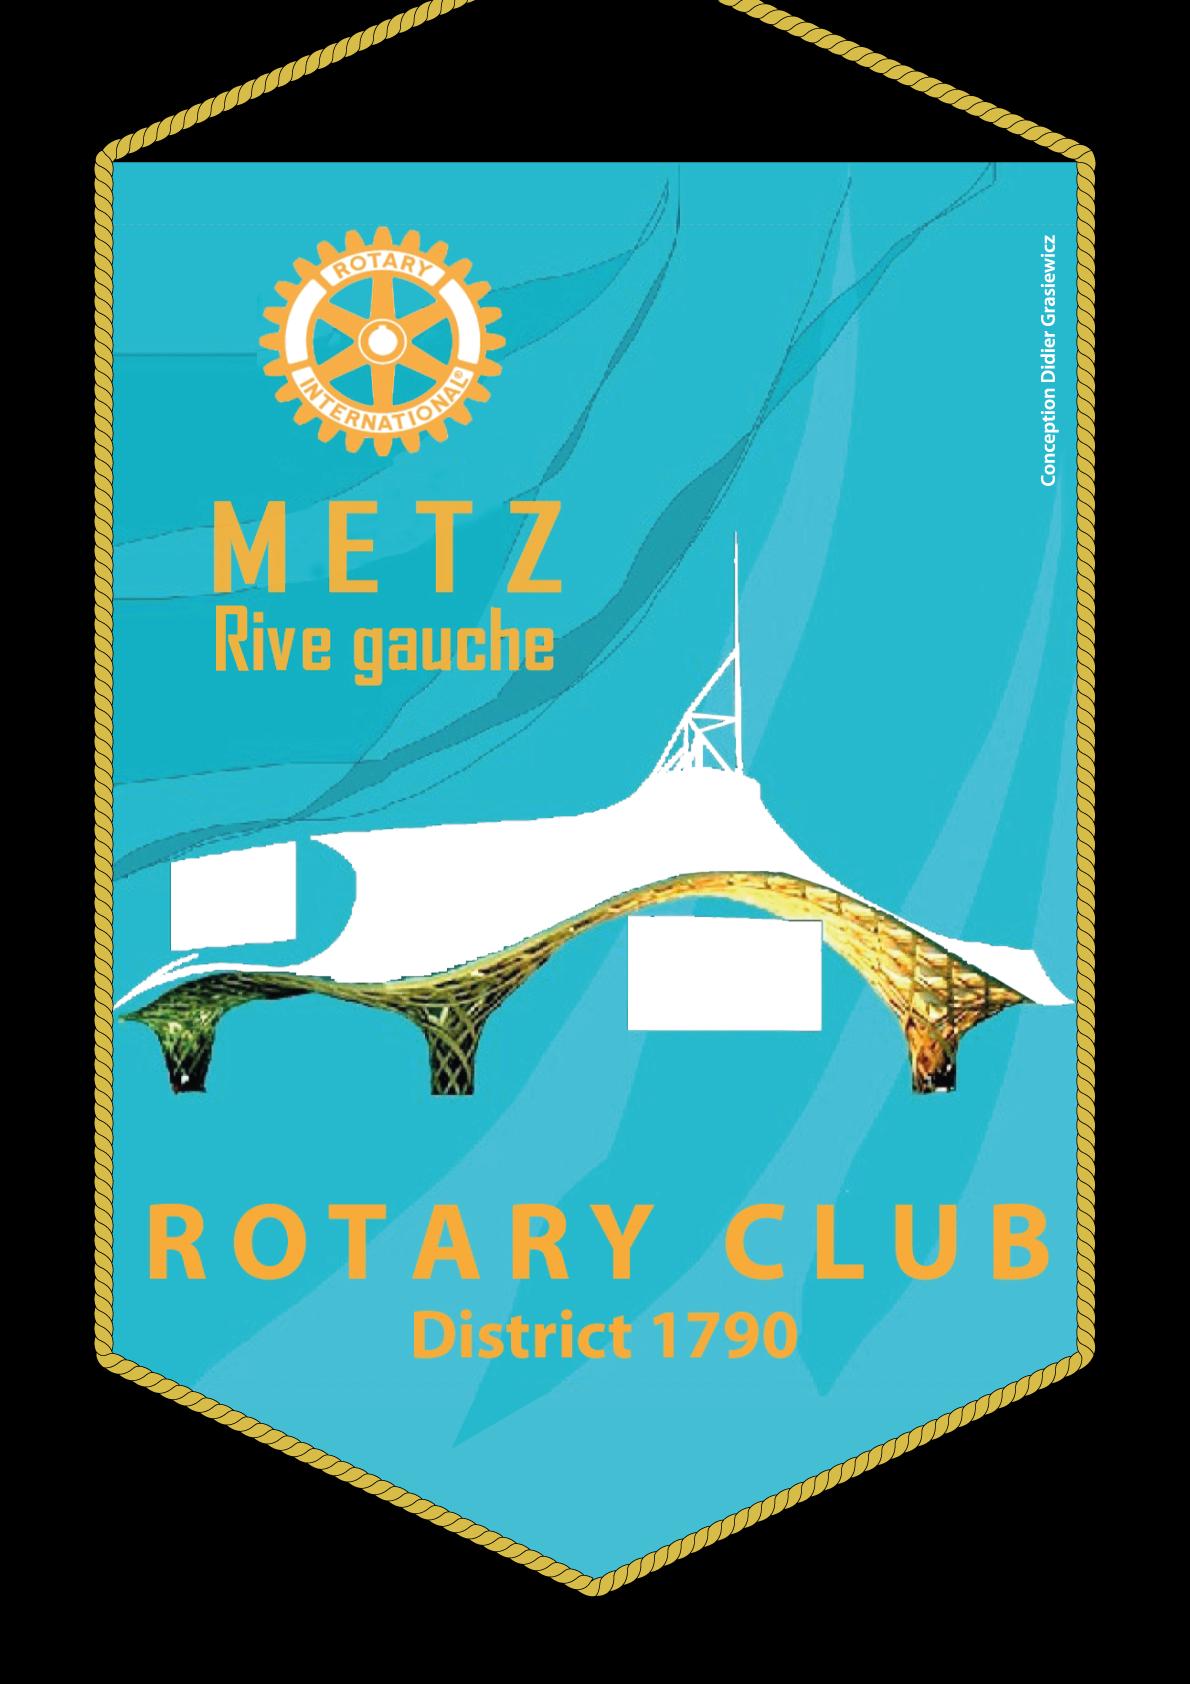 FANION ROTARY CLUB METZ RIVE GAUCHE